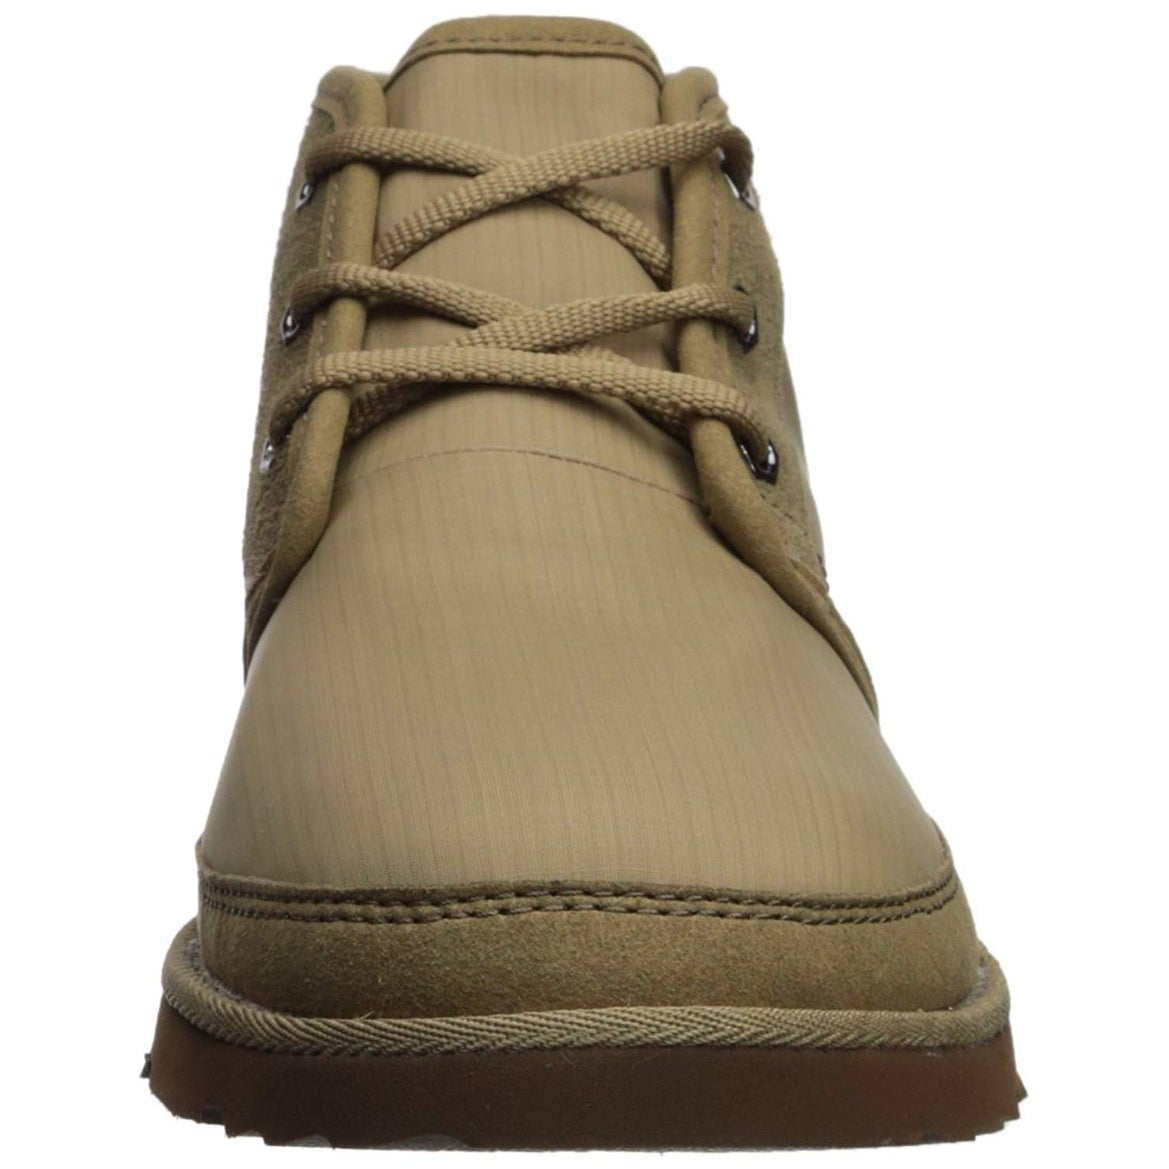 4c50ce163ba UGG Men's Neumel Ripstop Sneaker